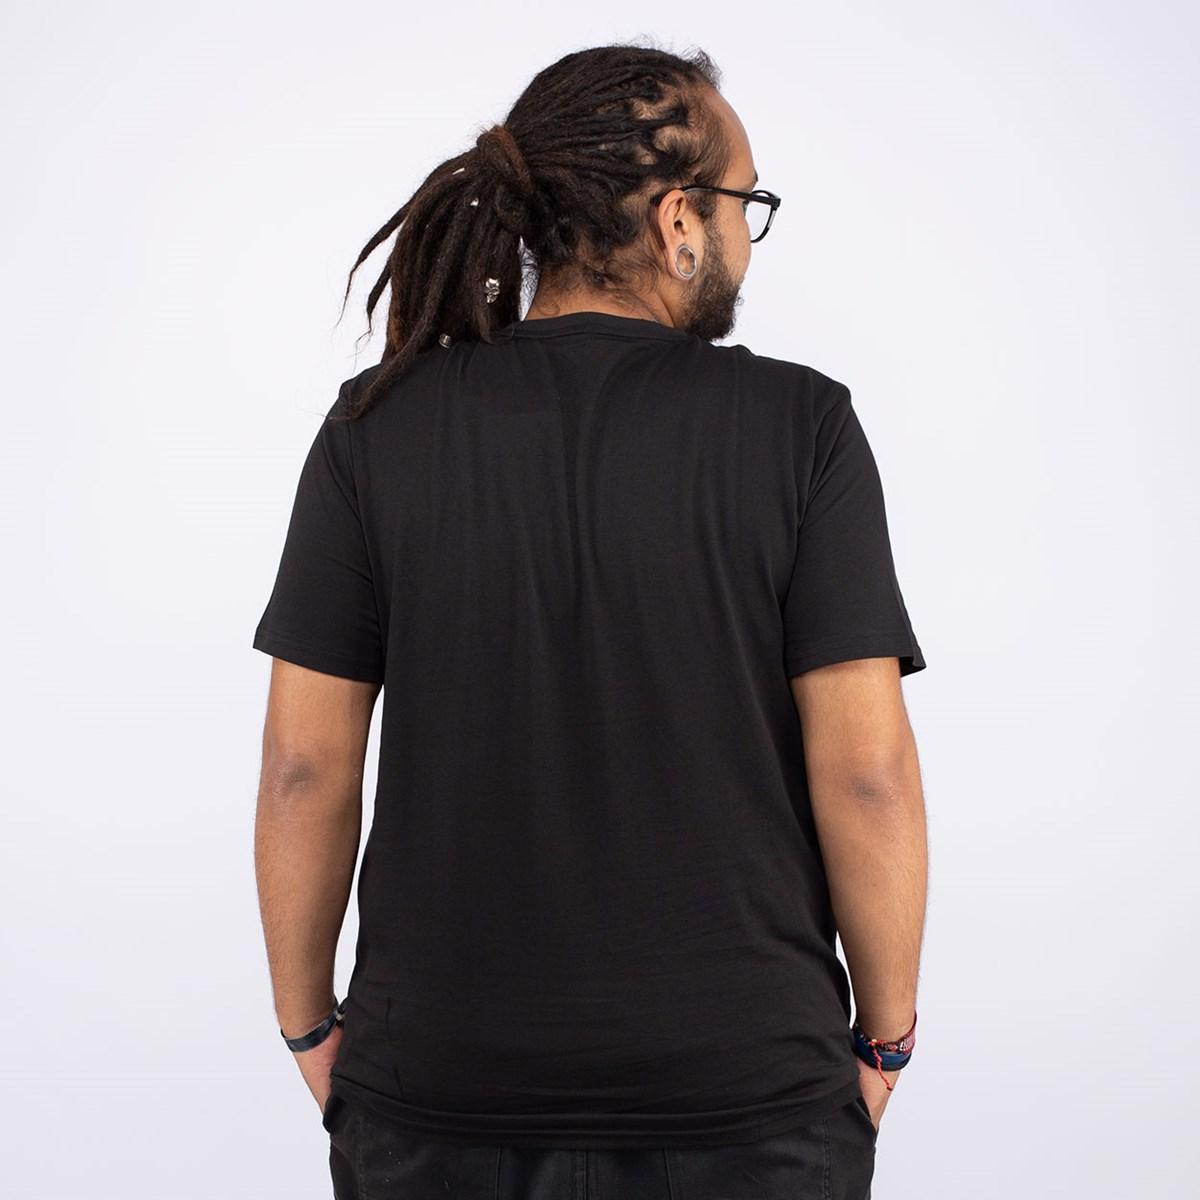 Camiseta Puma Rebel 5 Continents Black 584607-01